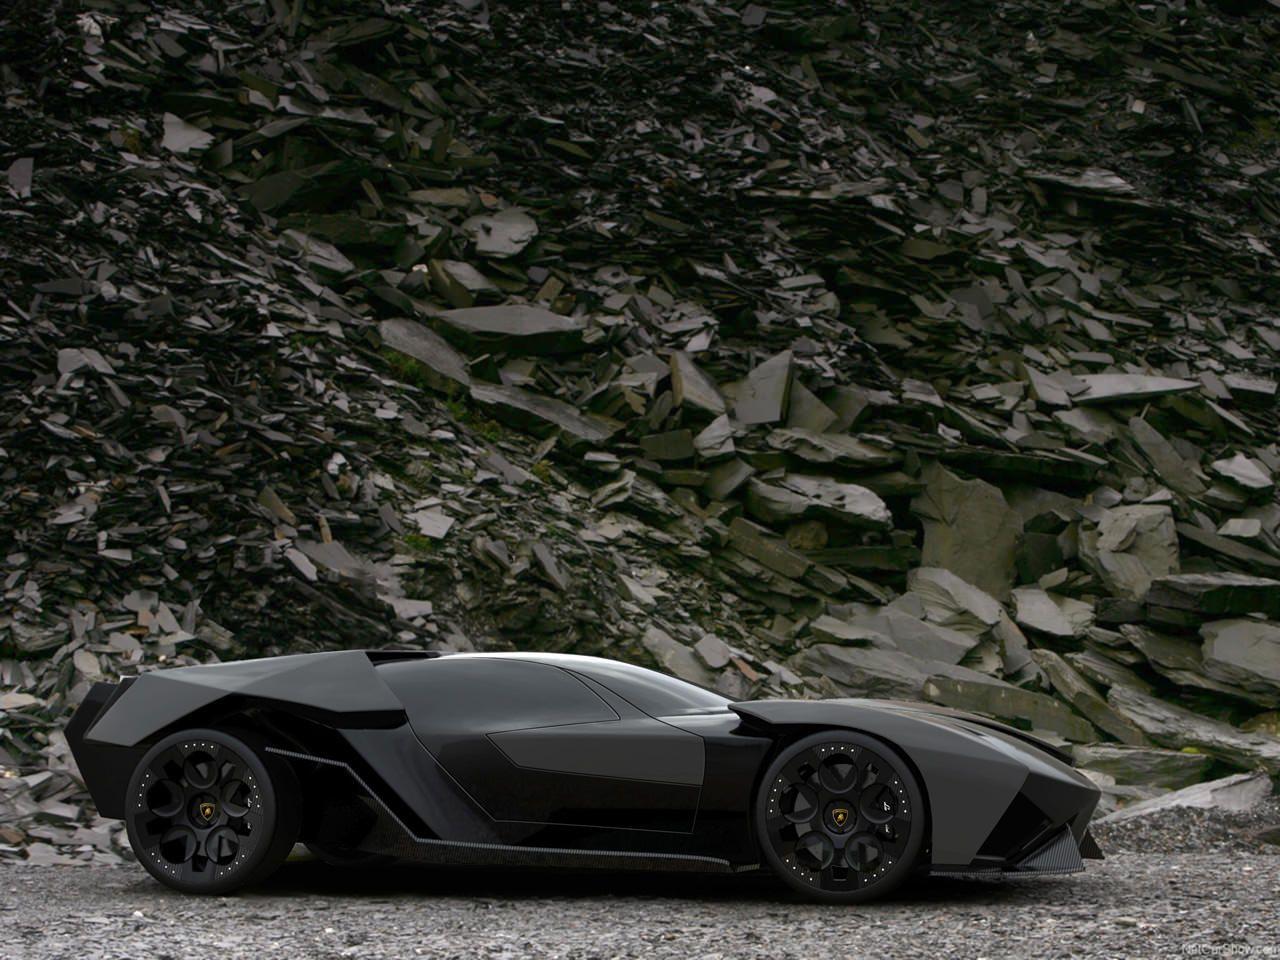 Lamborghini Ankonian Design by Slavche Tanevski via Igor Tomasic